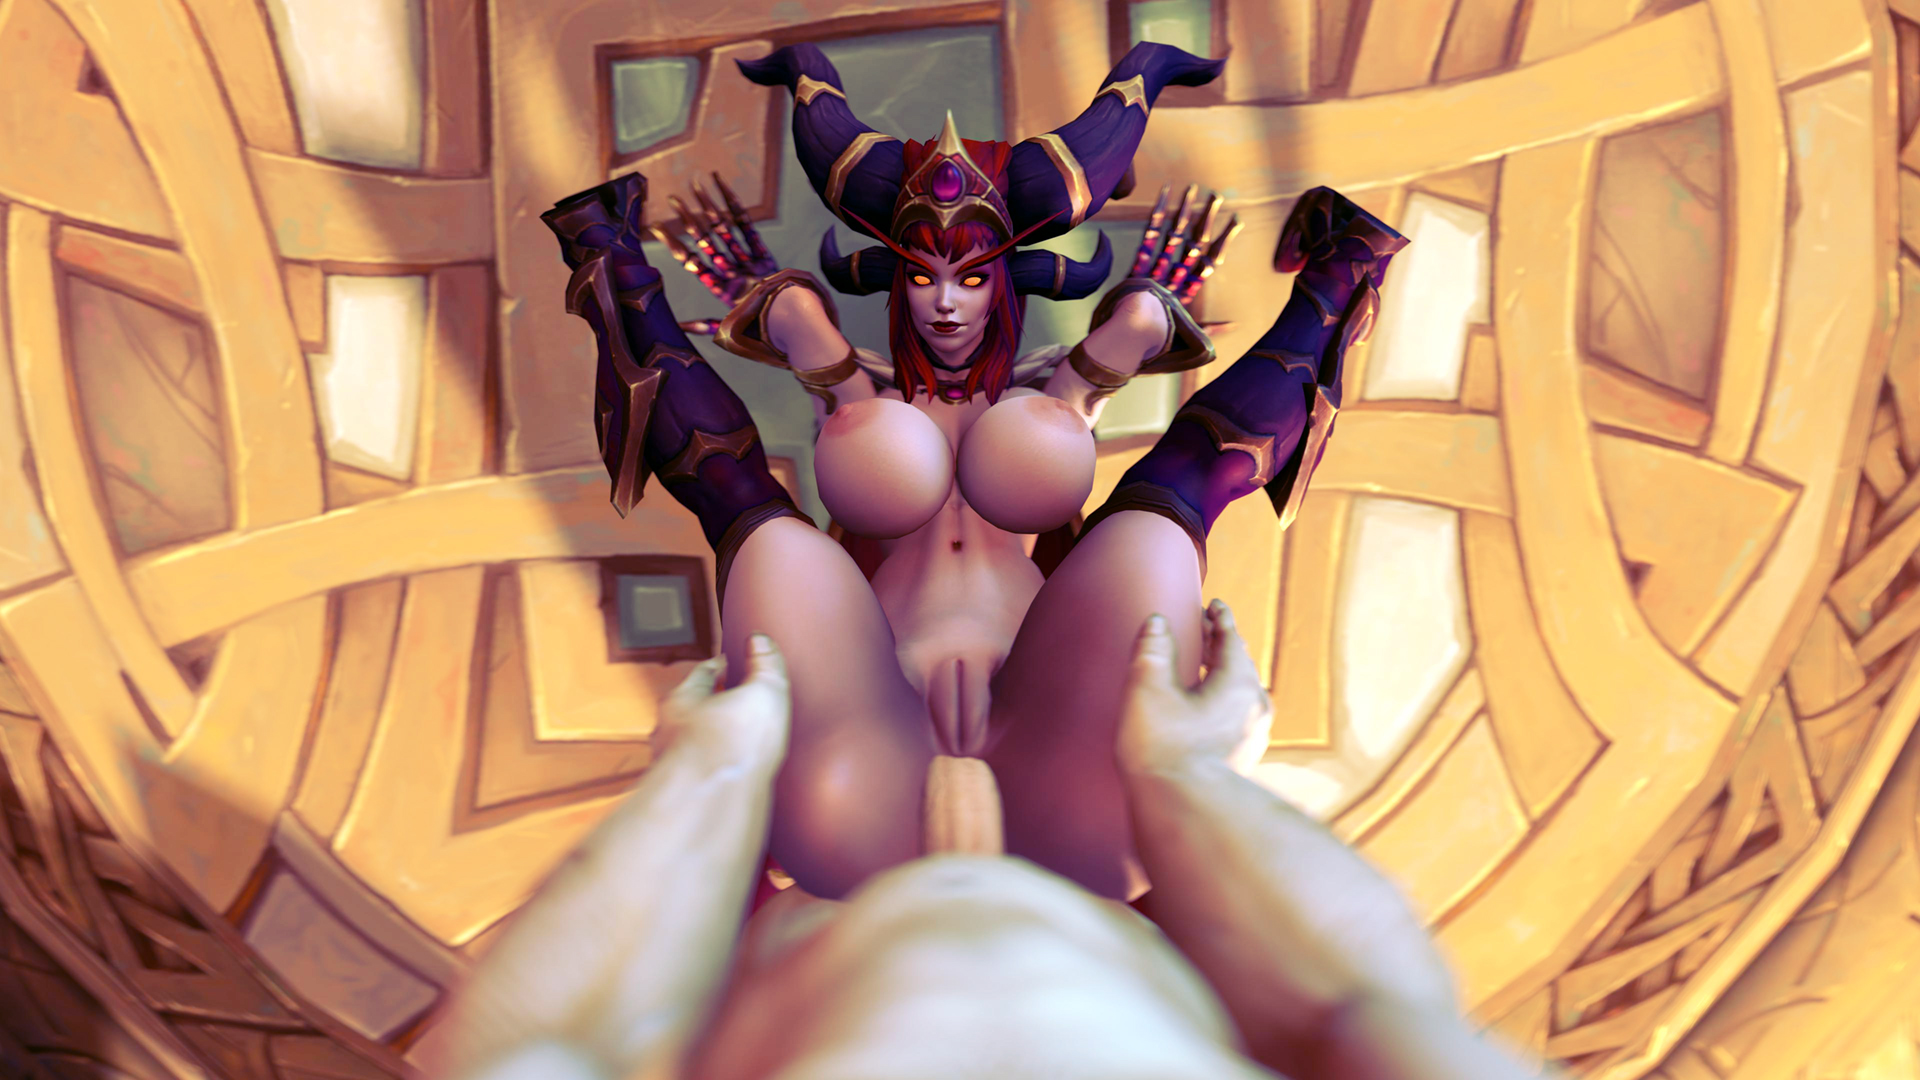 Sexy wit latina pussy